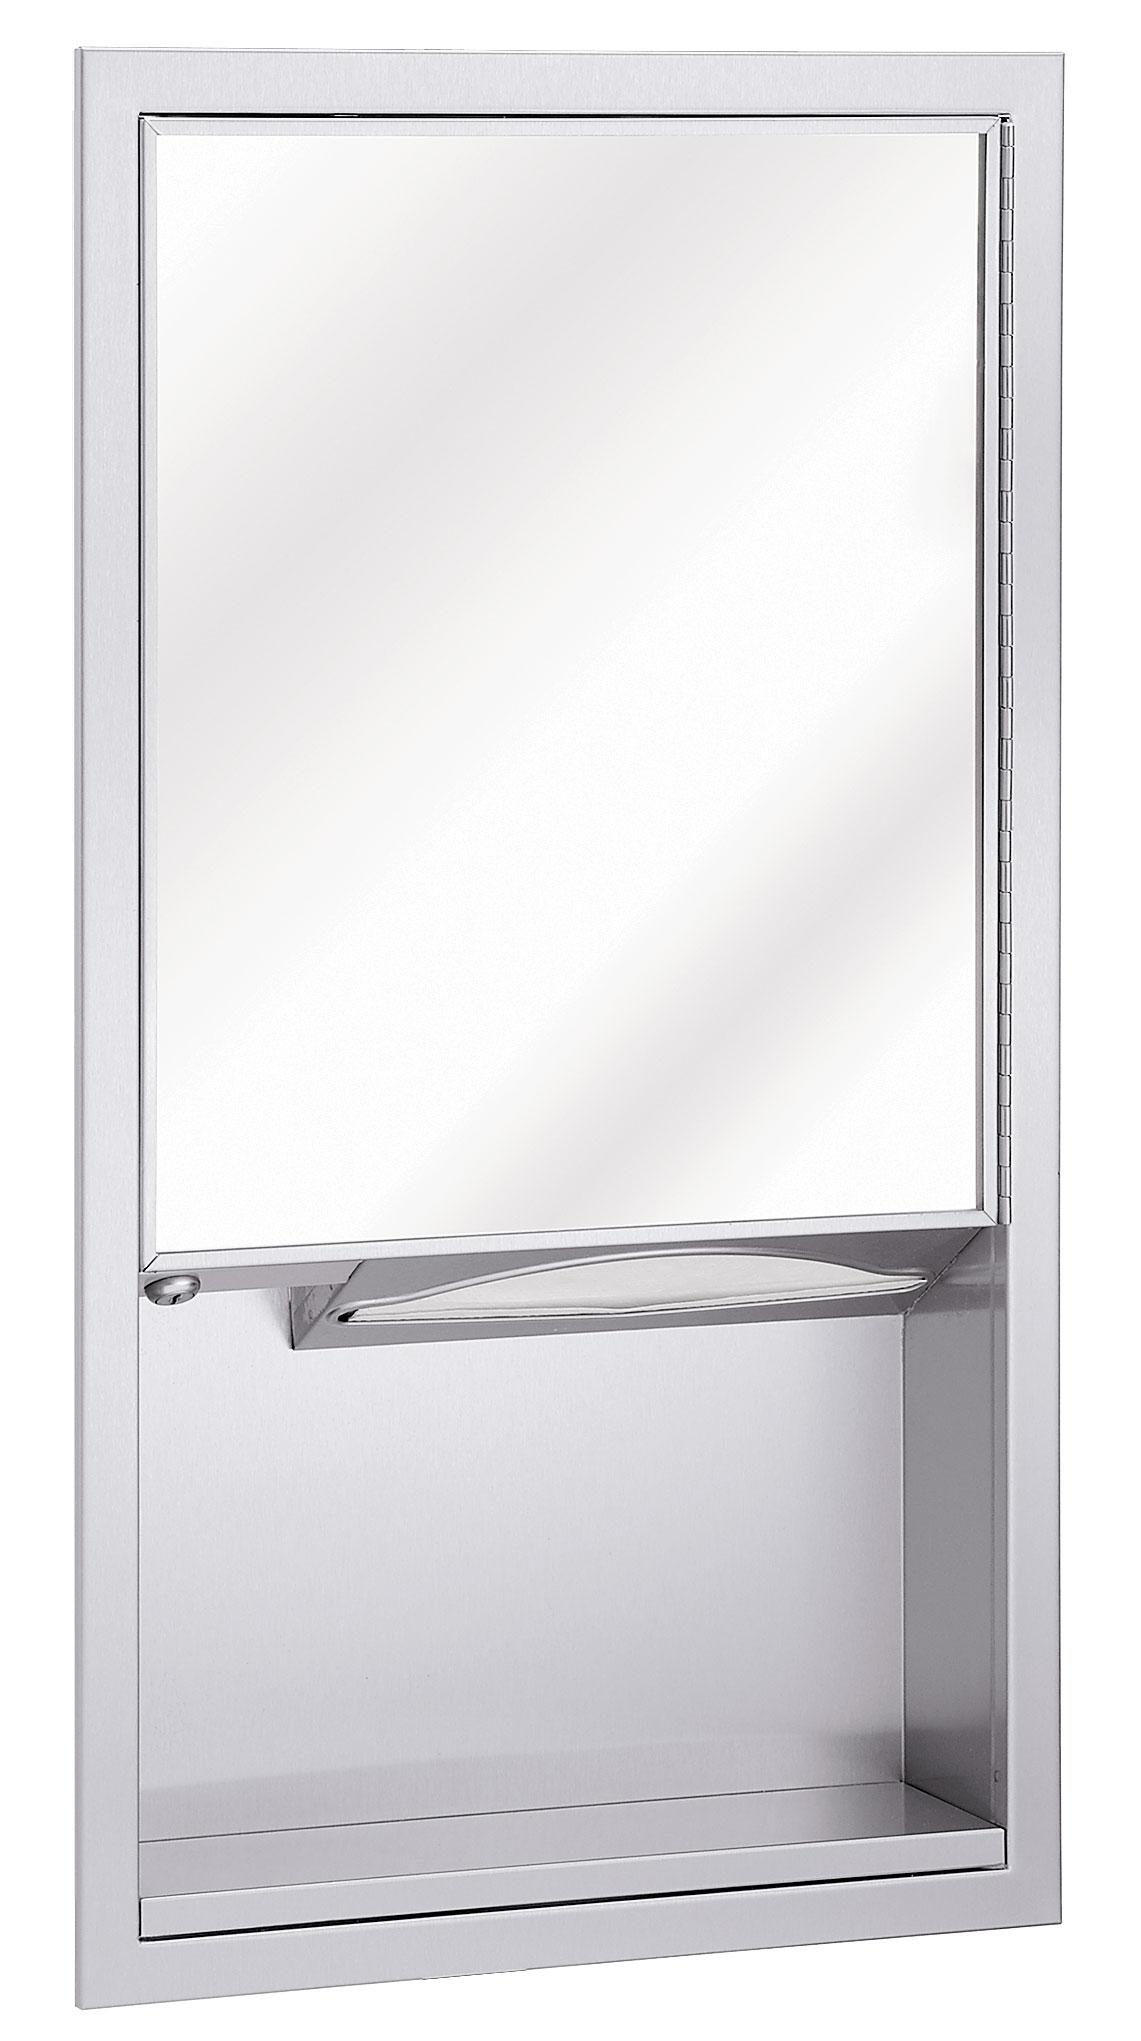 Charming Bradley Mirror #8: Mirror, Towel Dispenser Multi-Purpose Unit